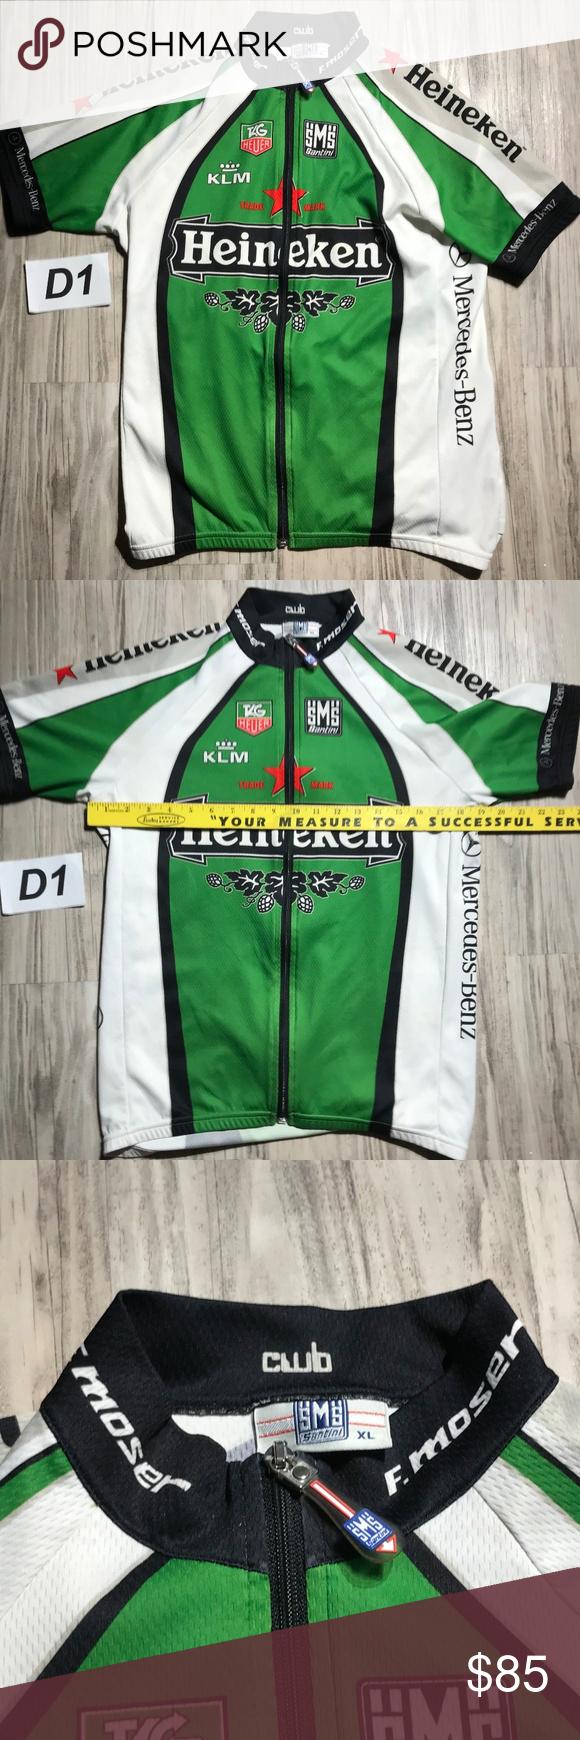 SMS Cycle Jersey Heineken Tag Hauer Mercedes Benz SMS Santini Cycling  Jersey Mens Heineken f6af7f519